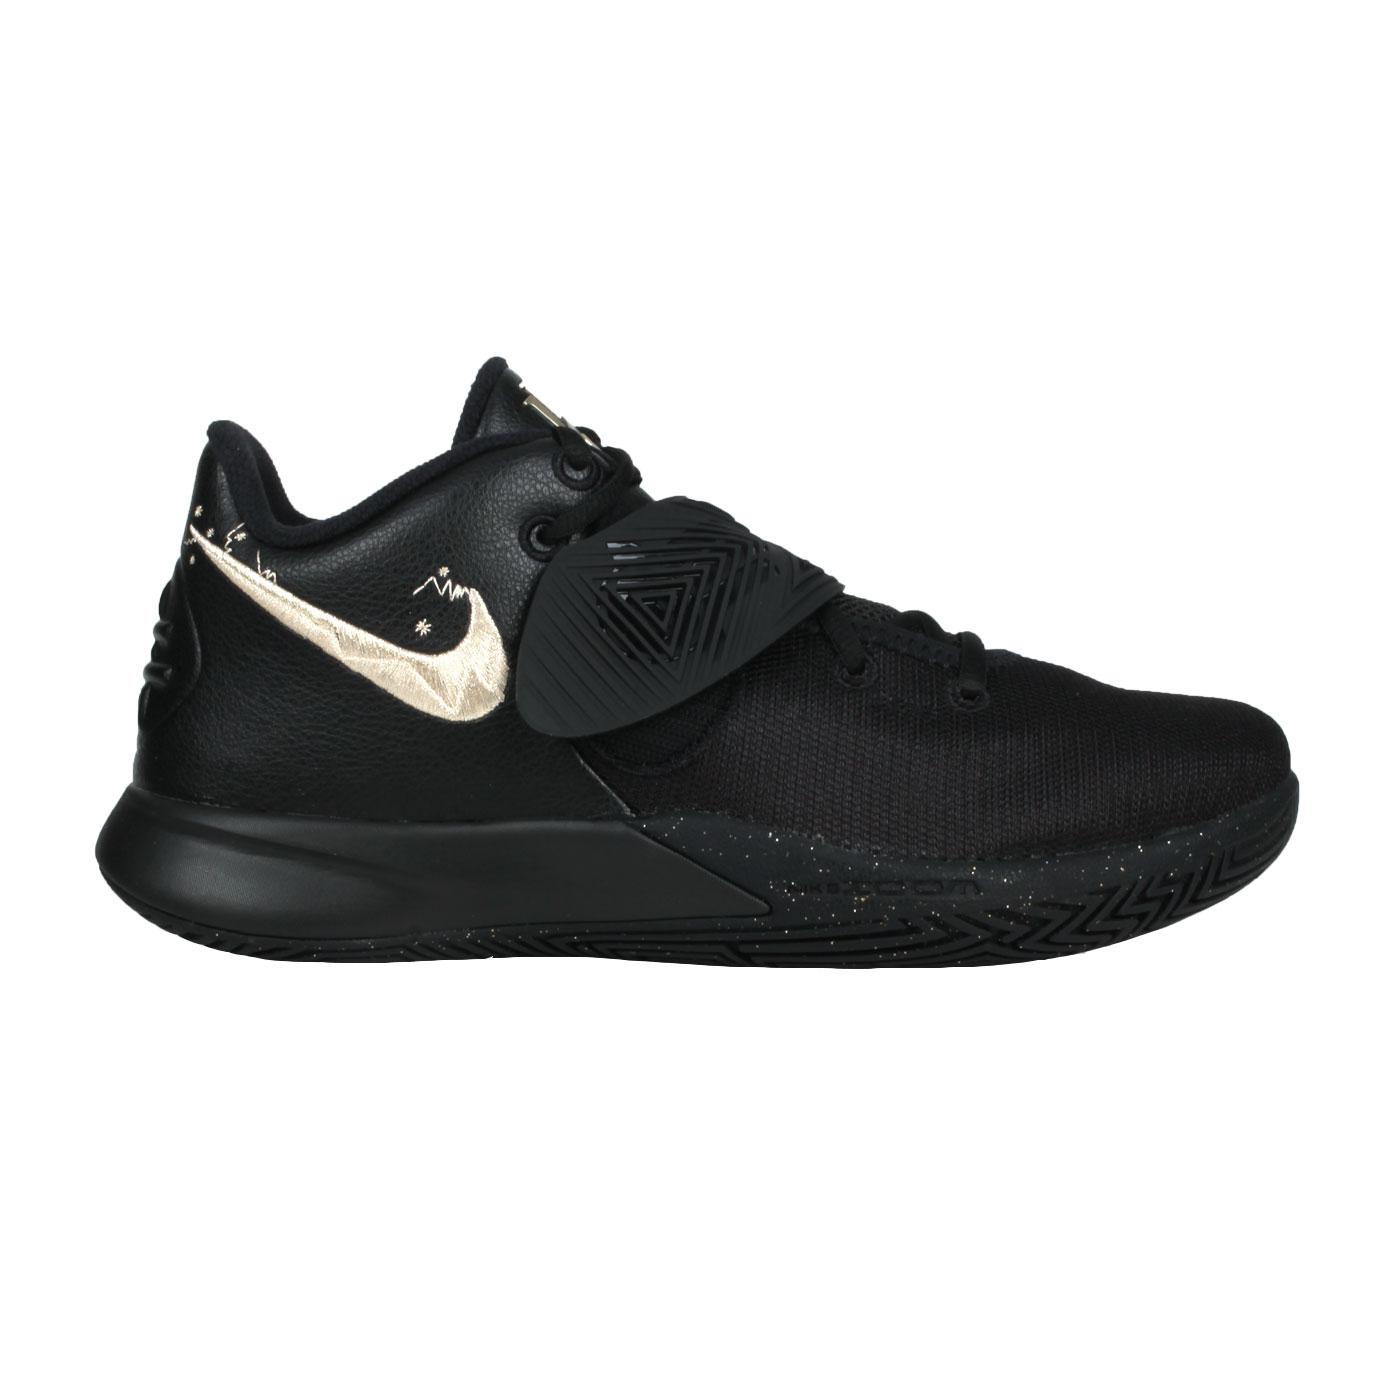 NIKE 男款籃球鞋  @KYRIE FLYTRAP III EP@CD0191008 - 黑金